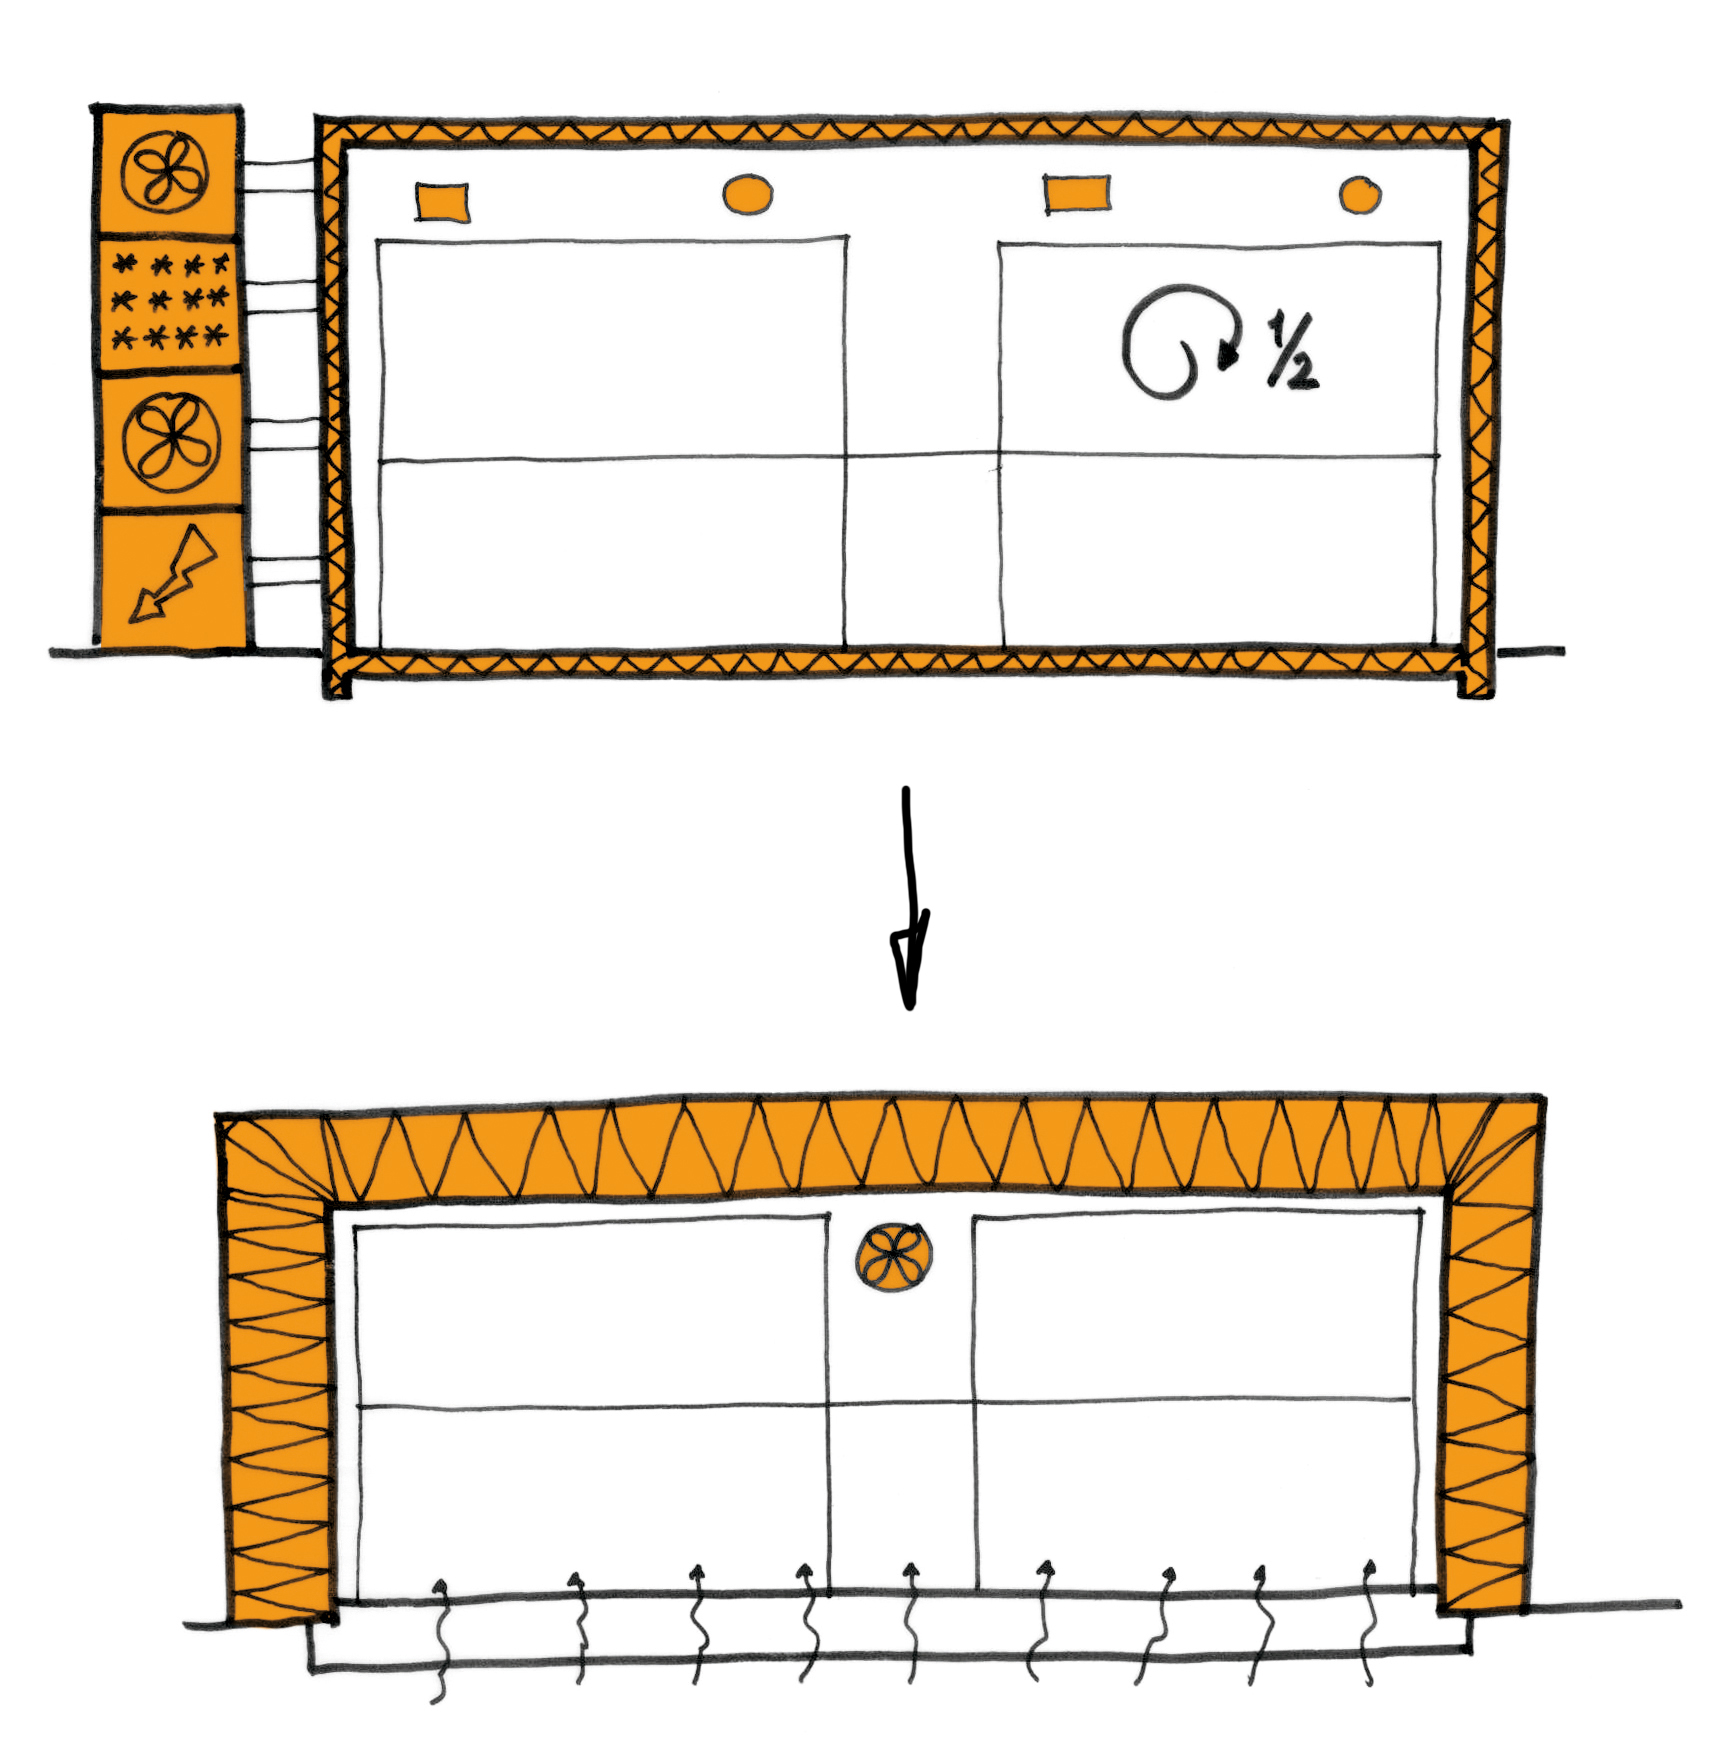 <p>Concept installatiearm</p>